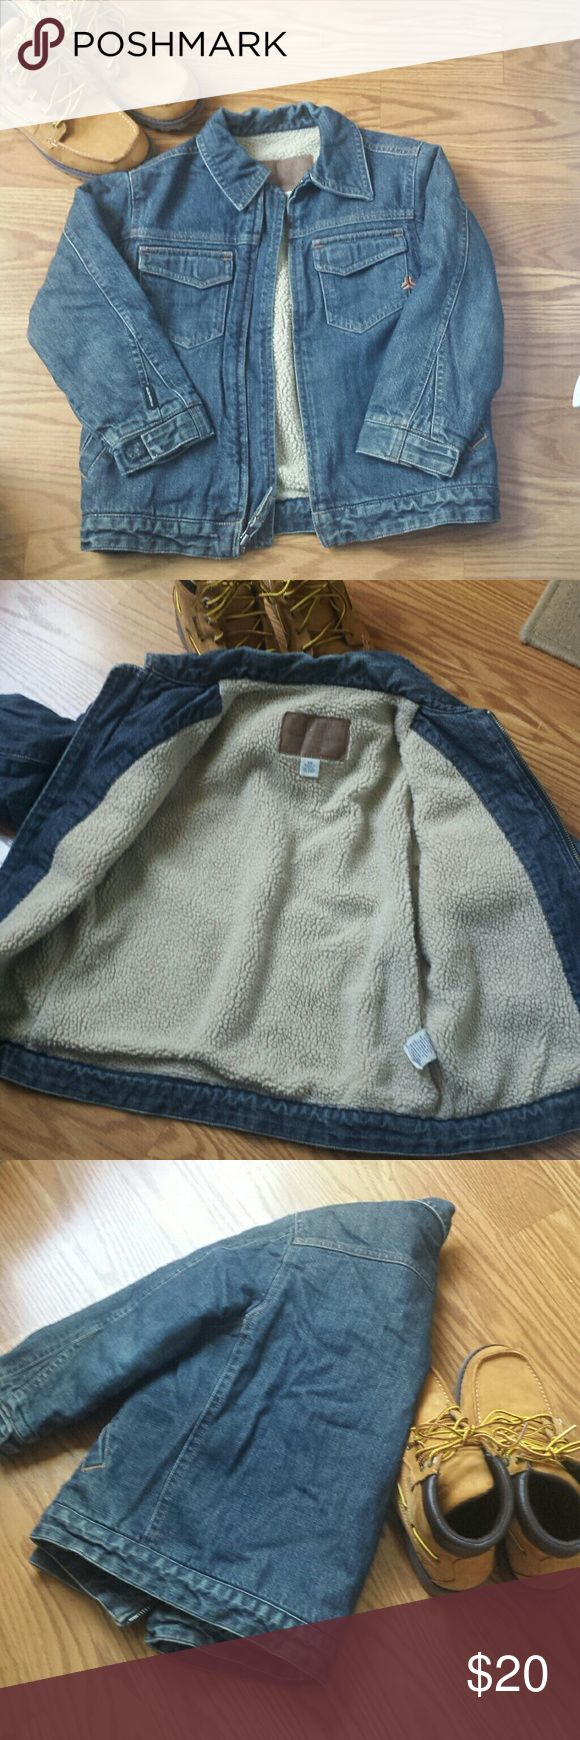 Old navy jean jacket Kids Old navy blue jeans jacket Old Navy Jackets & Coats Jean Jackets